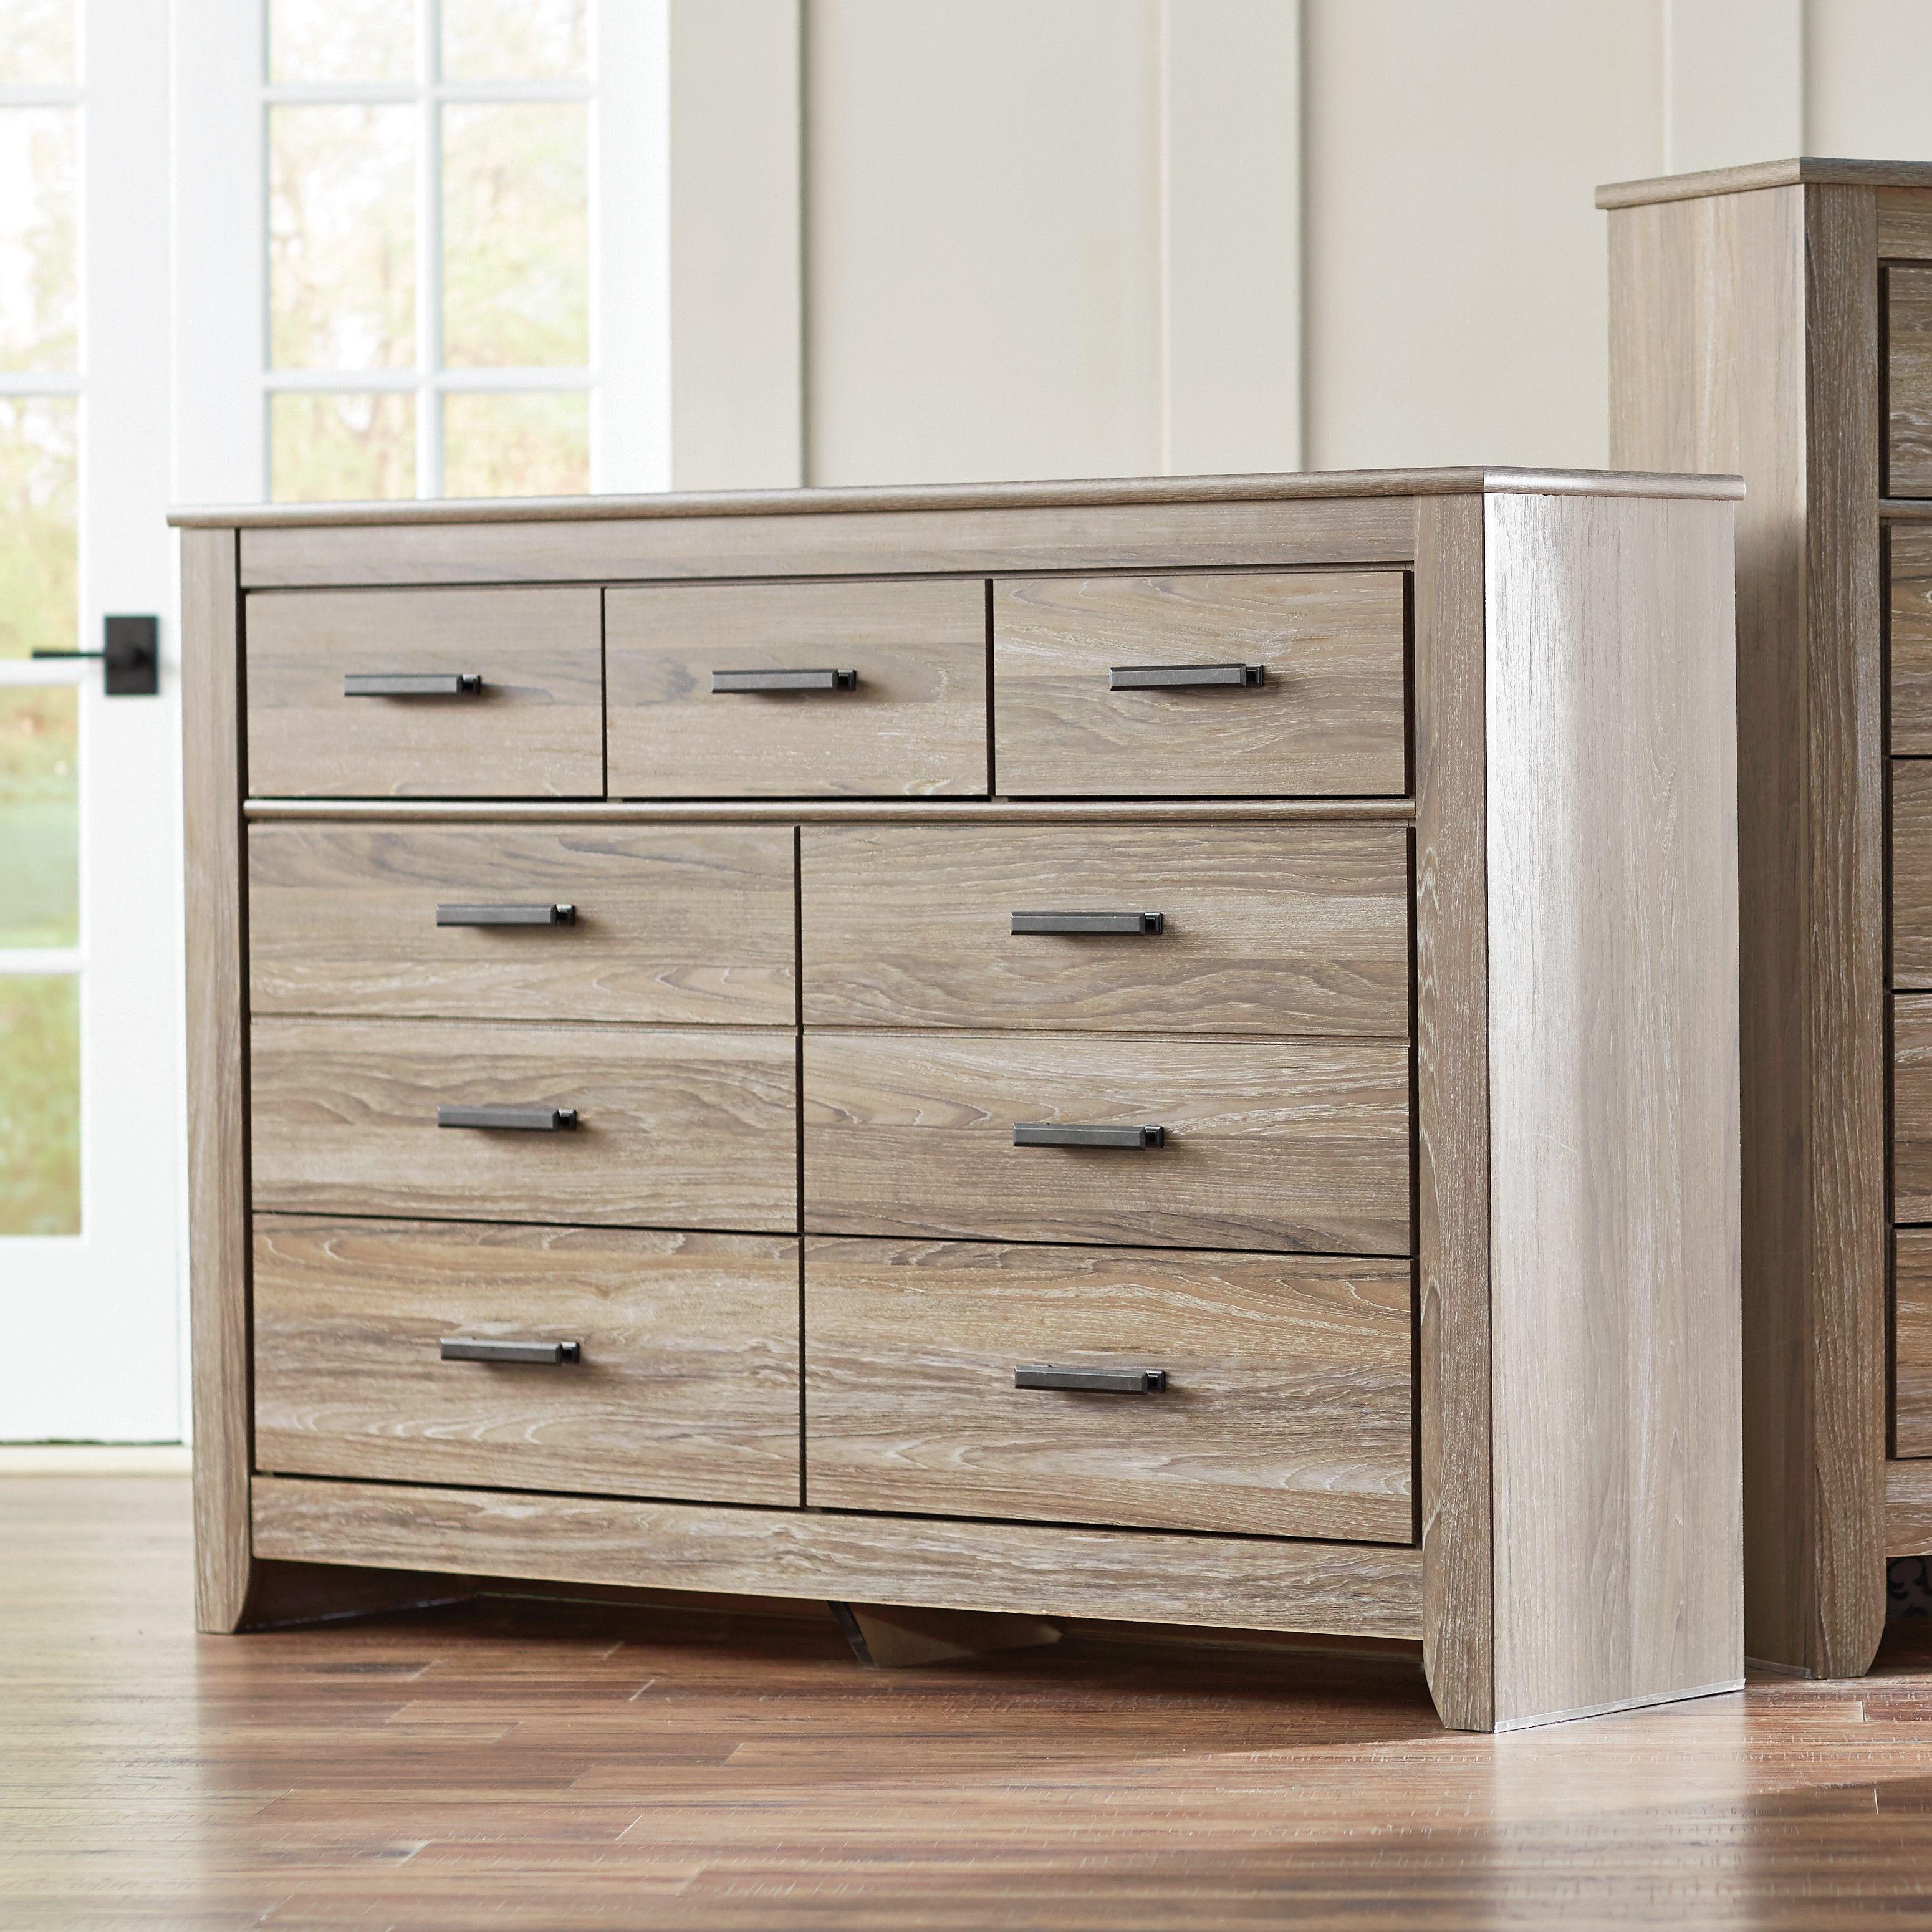 Herard 7 Drawer Dresser Cómoda shabby chic, Muebles de